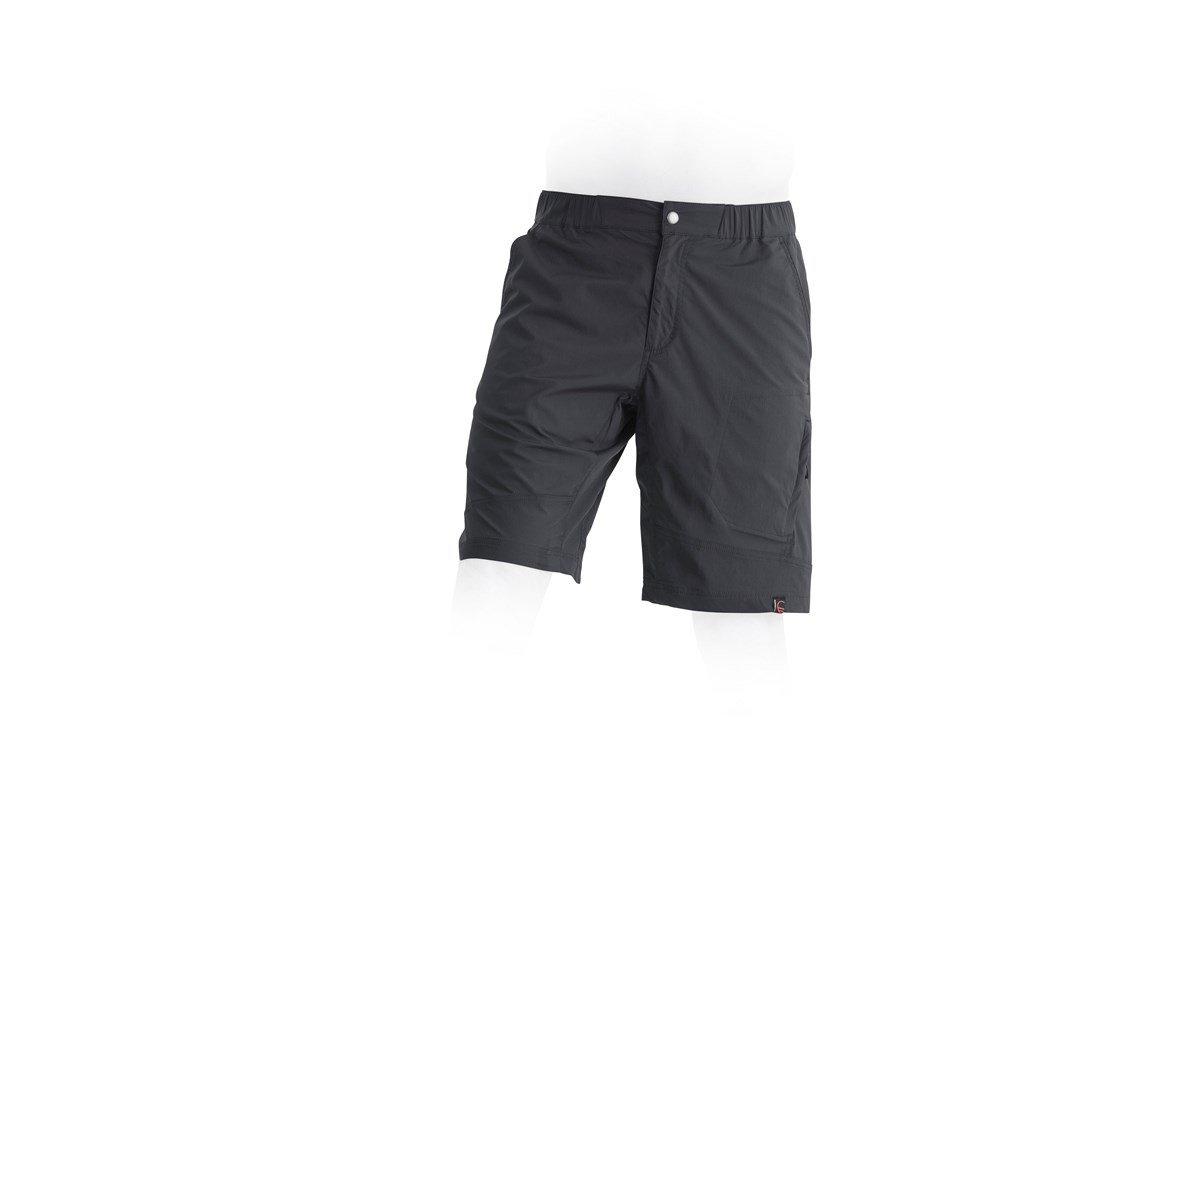 Wild Country Herren Mission Shorts Pants Kurze Hose